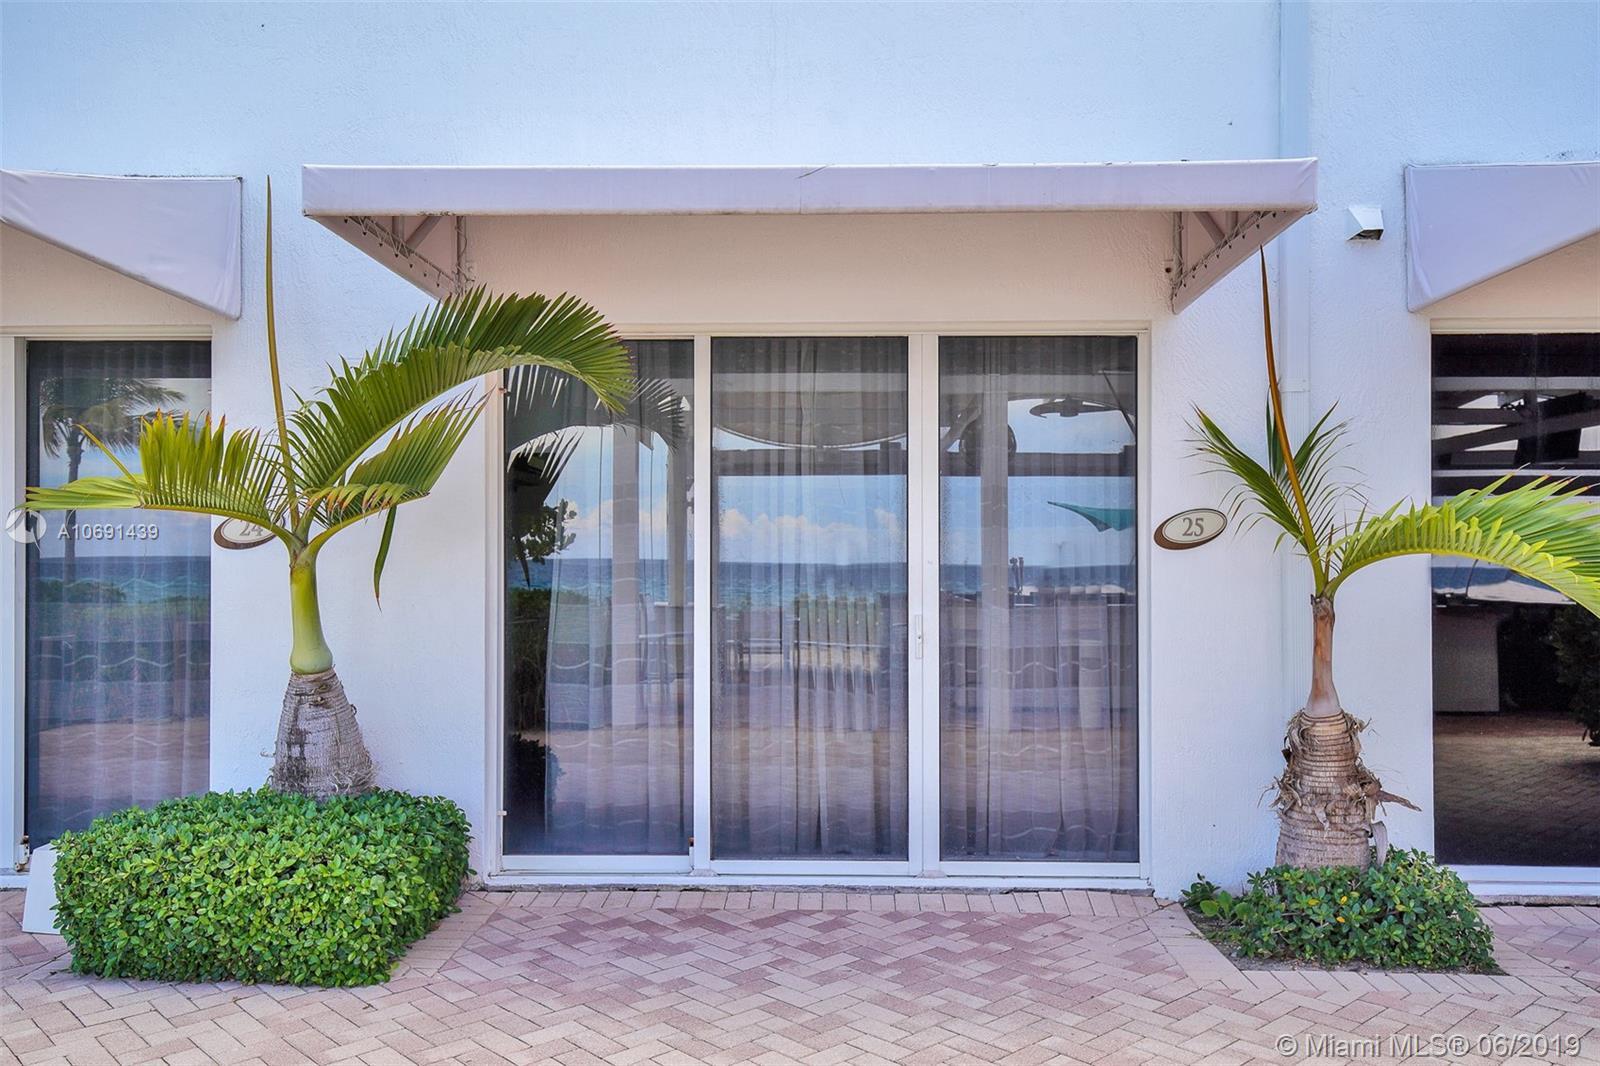 Trump International #CAB 25 - 18001 COLLINS AVE #CAB 25, Sunny Isles Beach, FL 33160